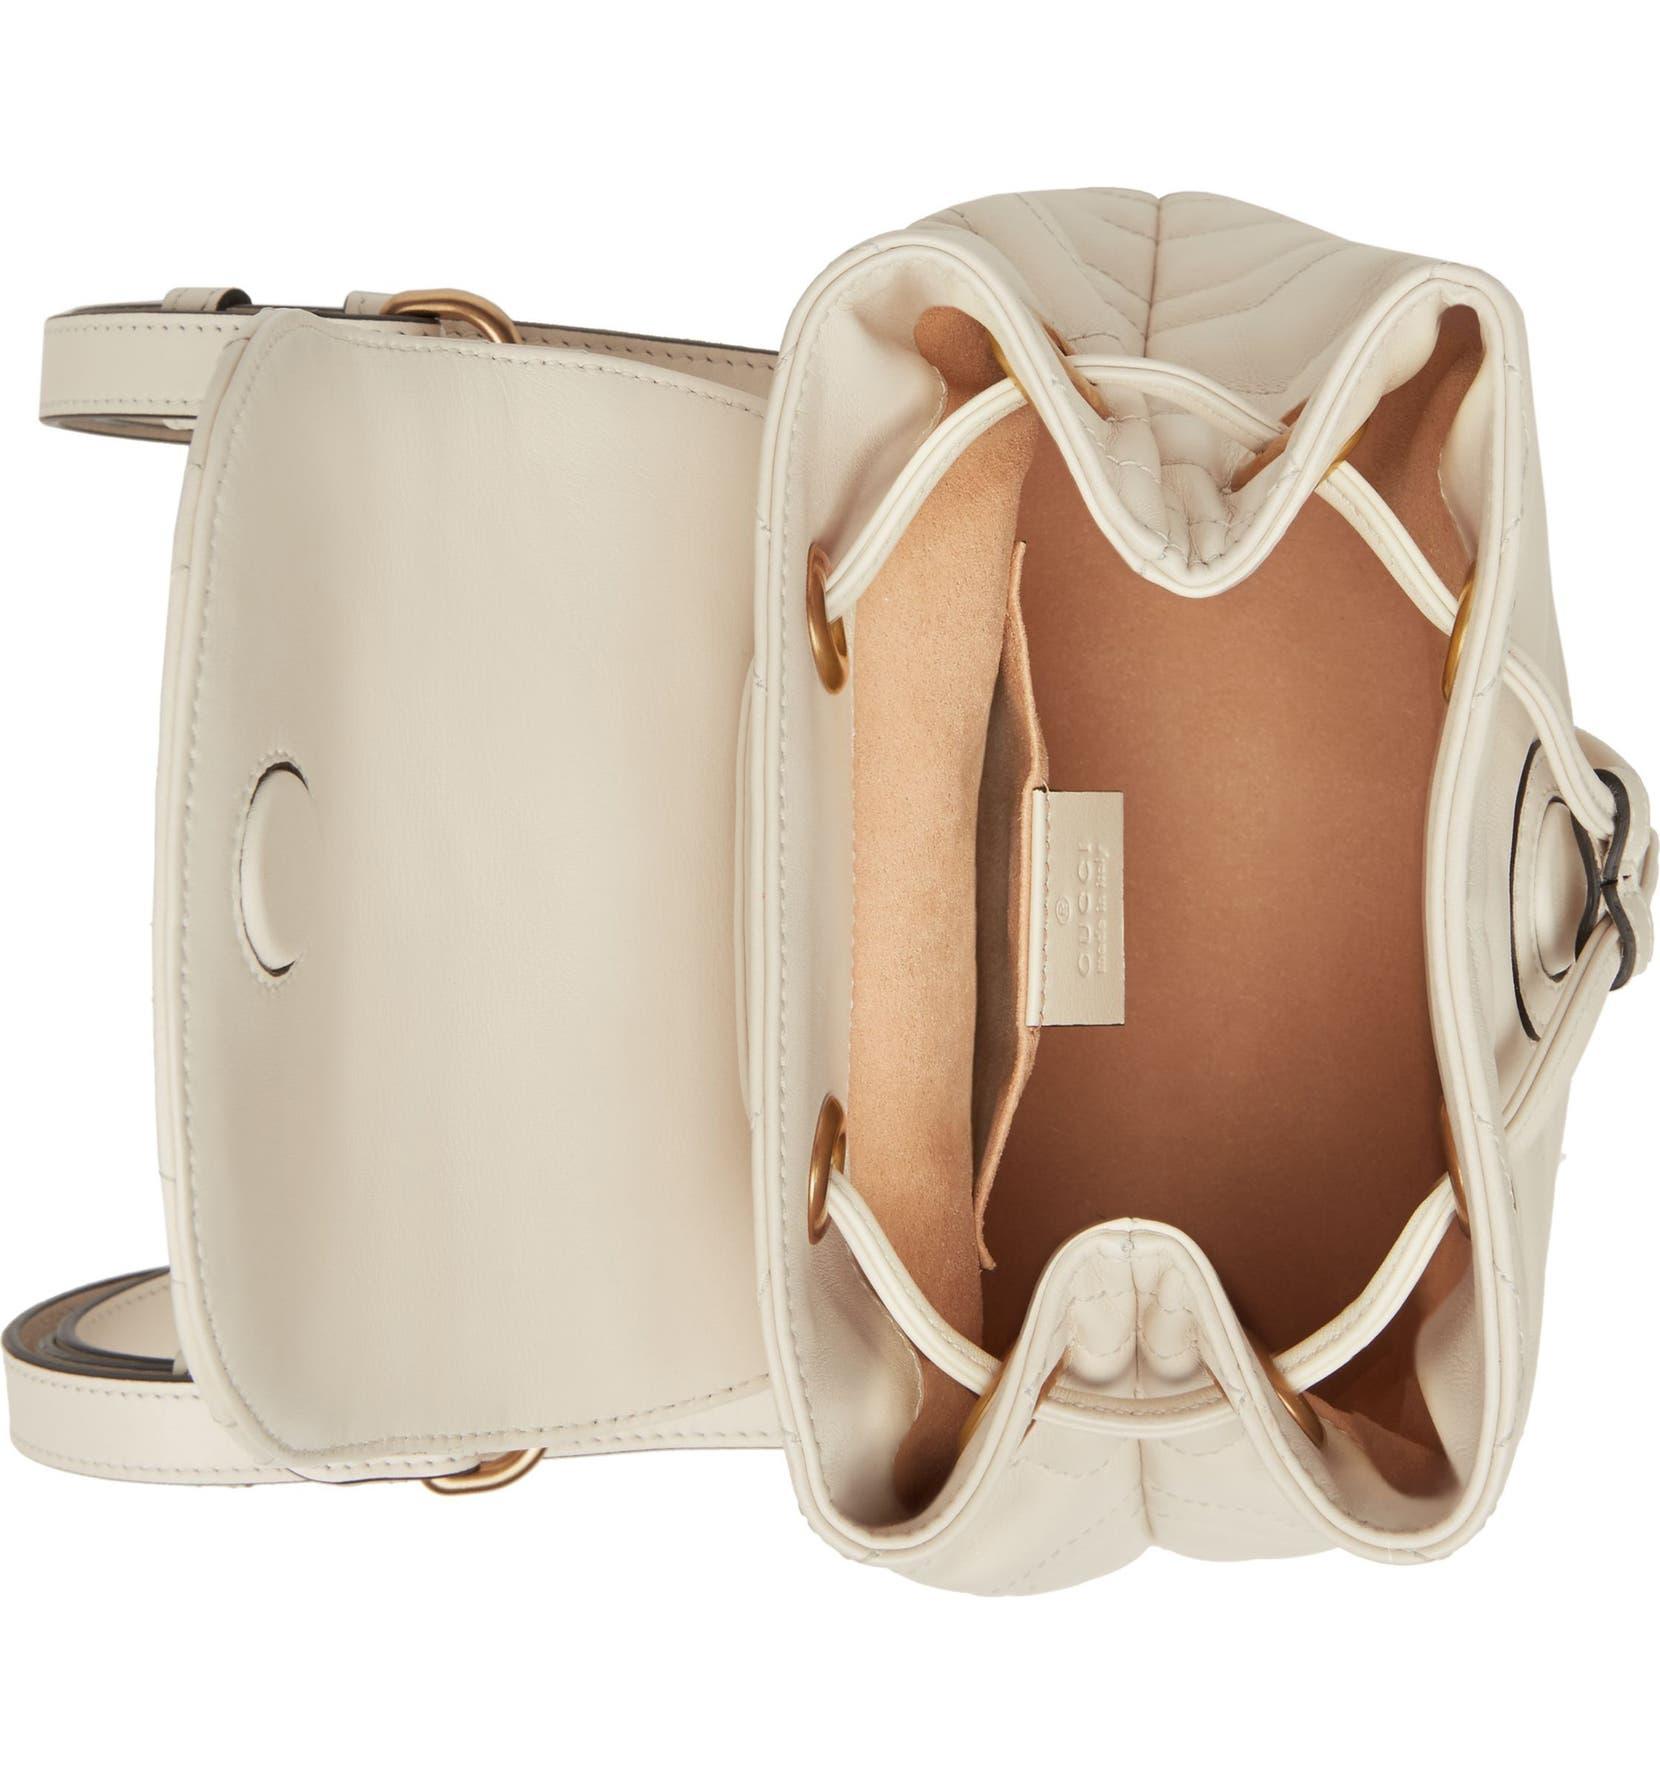 58c0fe39b Gucci GG Marmont 2.0 Matelassé Leather Mini Backpack | Nordstrom